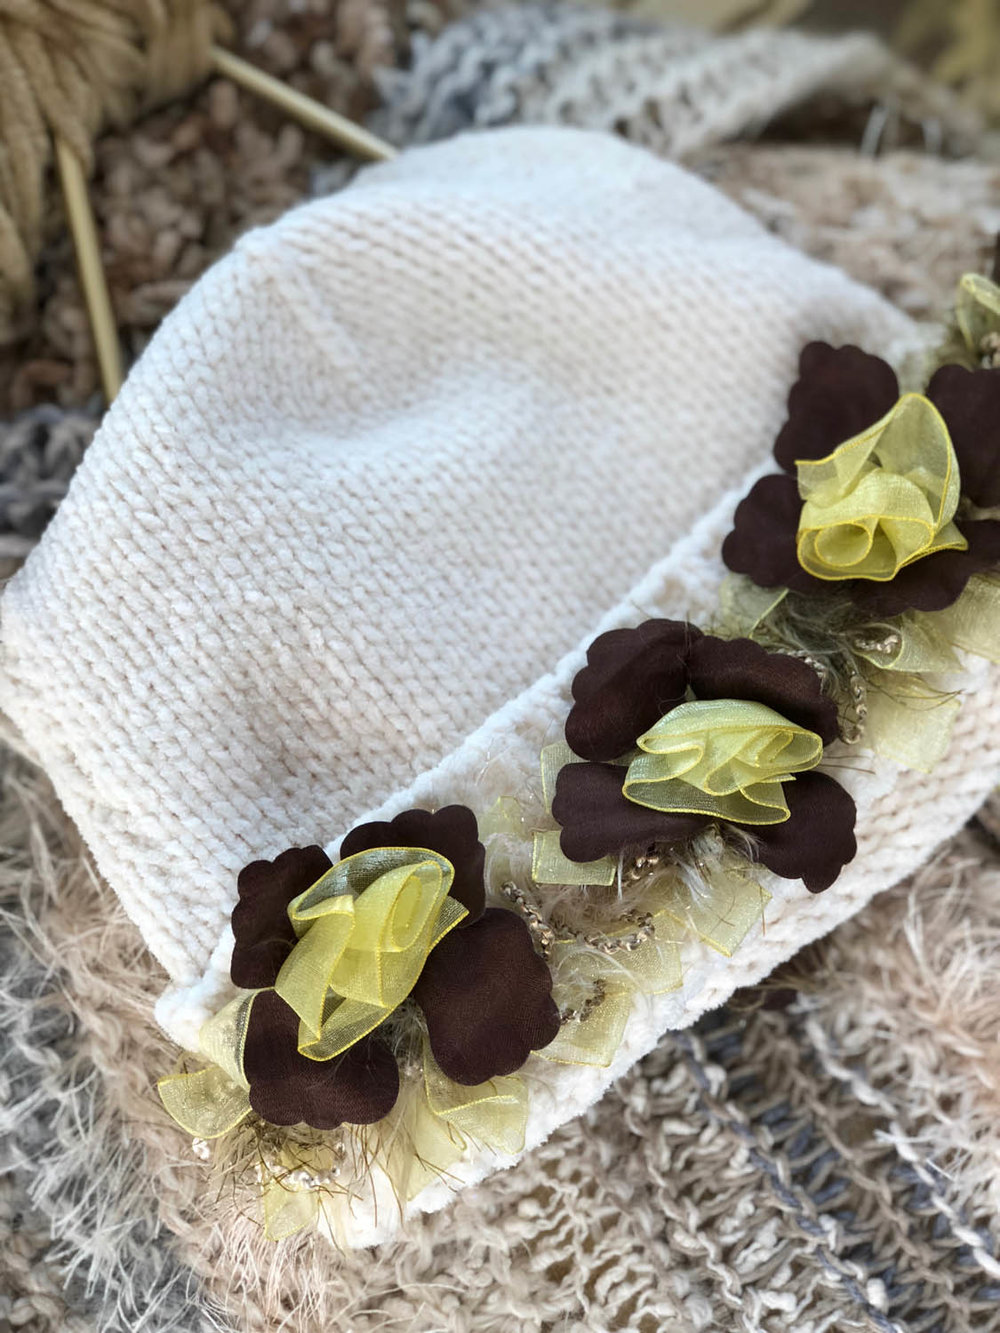 finished yellow ribbon rose trim embellishing a DIY white chenille women's winter hat